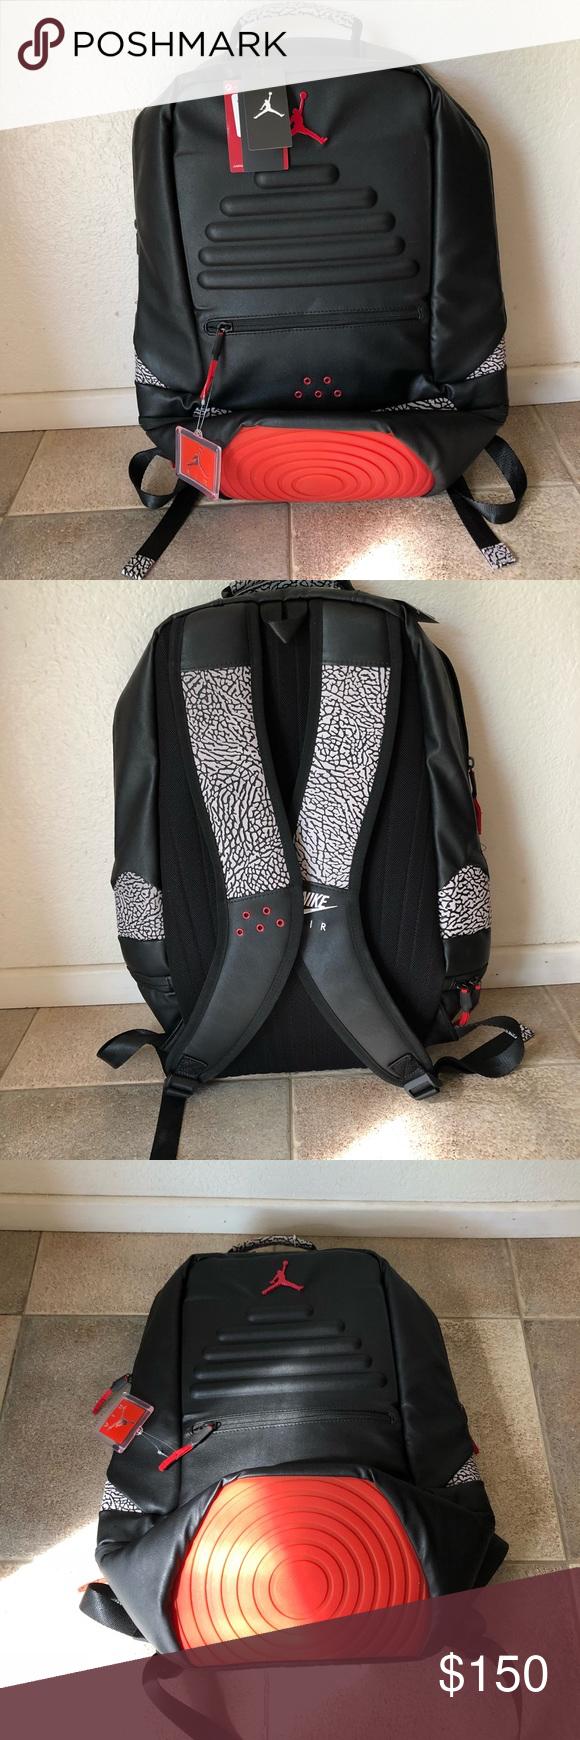 Jordan Retro 3 Backpack - Brand new Jordan Retro 3 Backpack - Red Black  color a2a8a803f280e